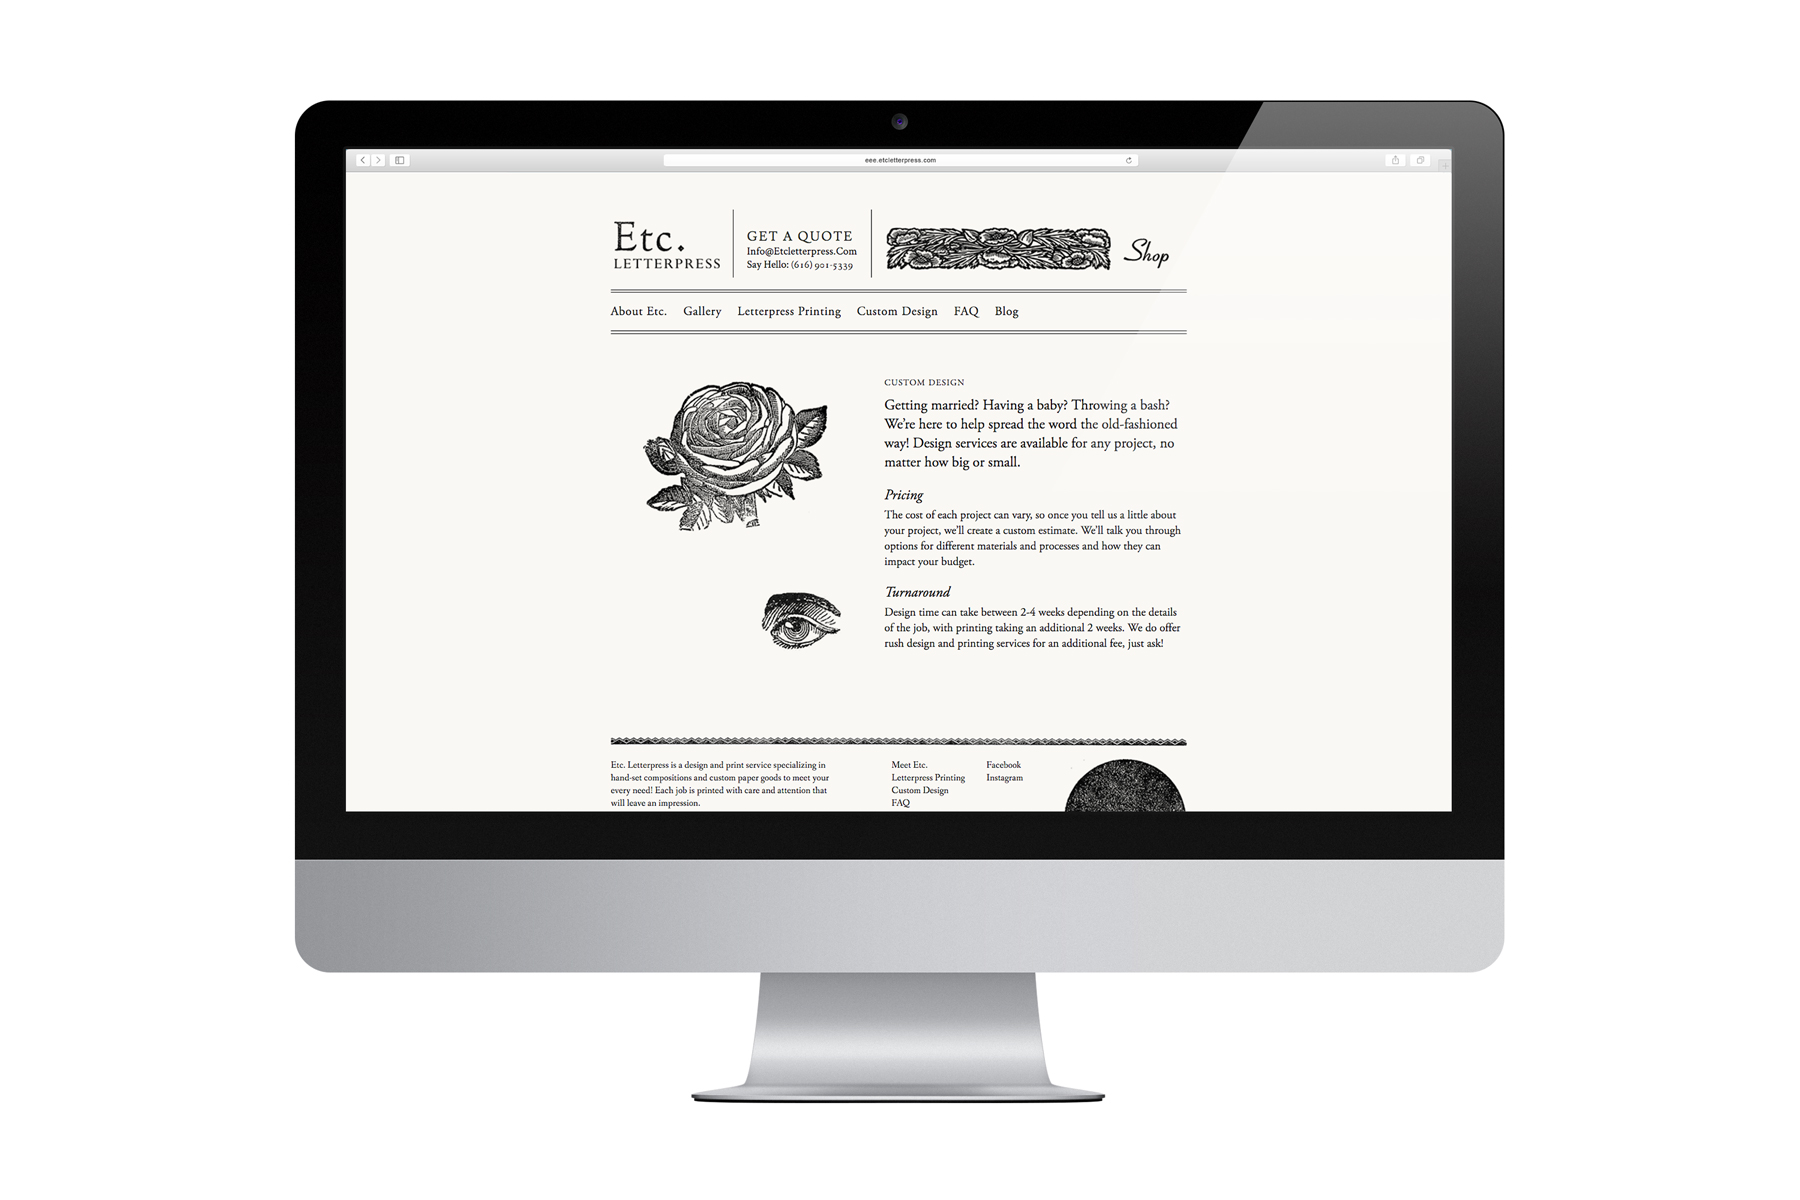 ETC-Letterpress_Website-Design_Rachelle-Sartini-Garner_01.jpg